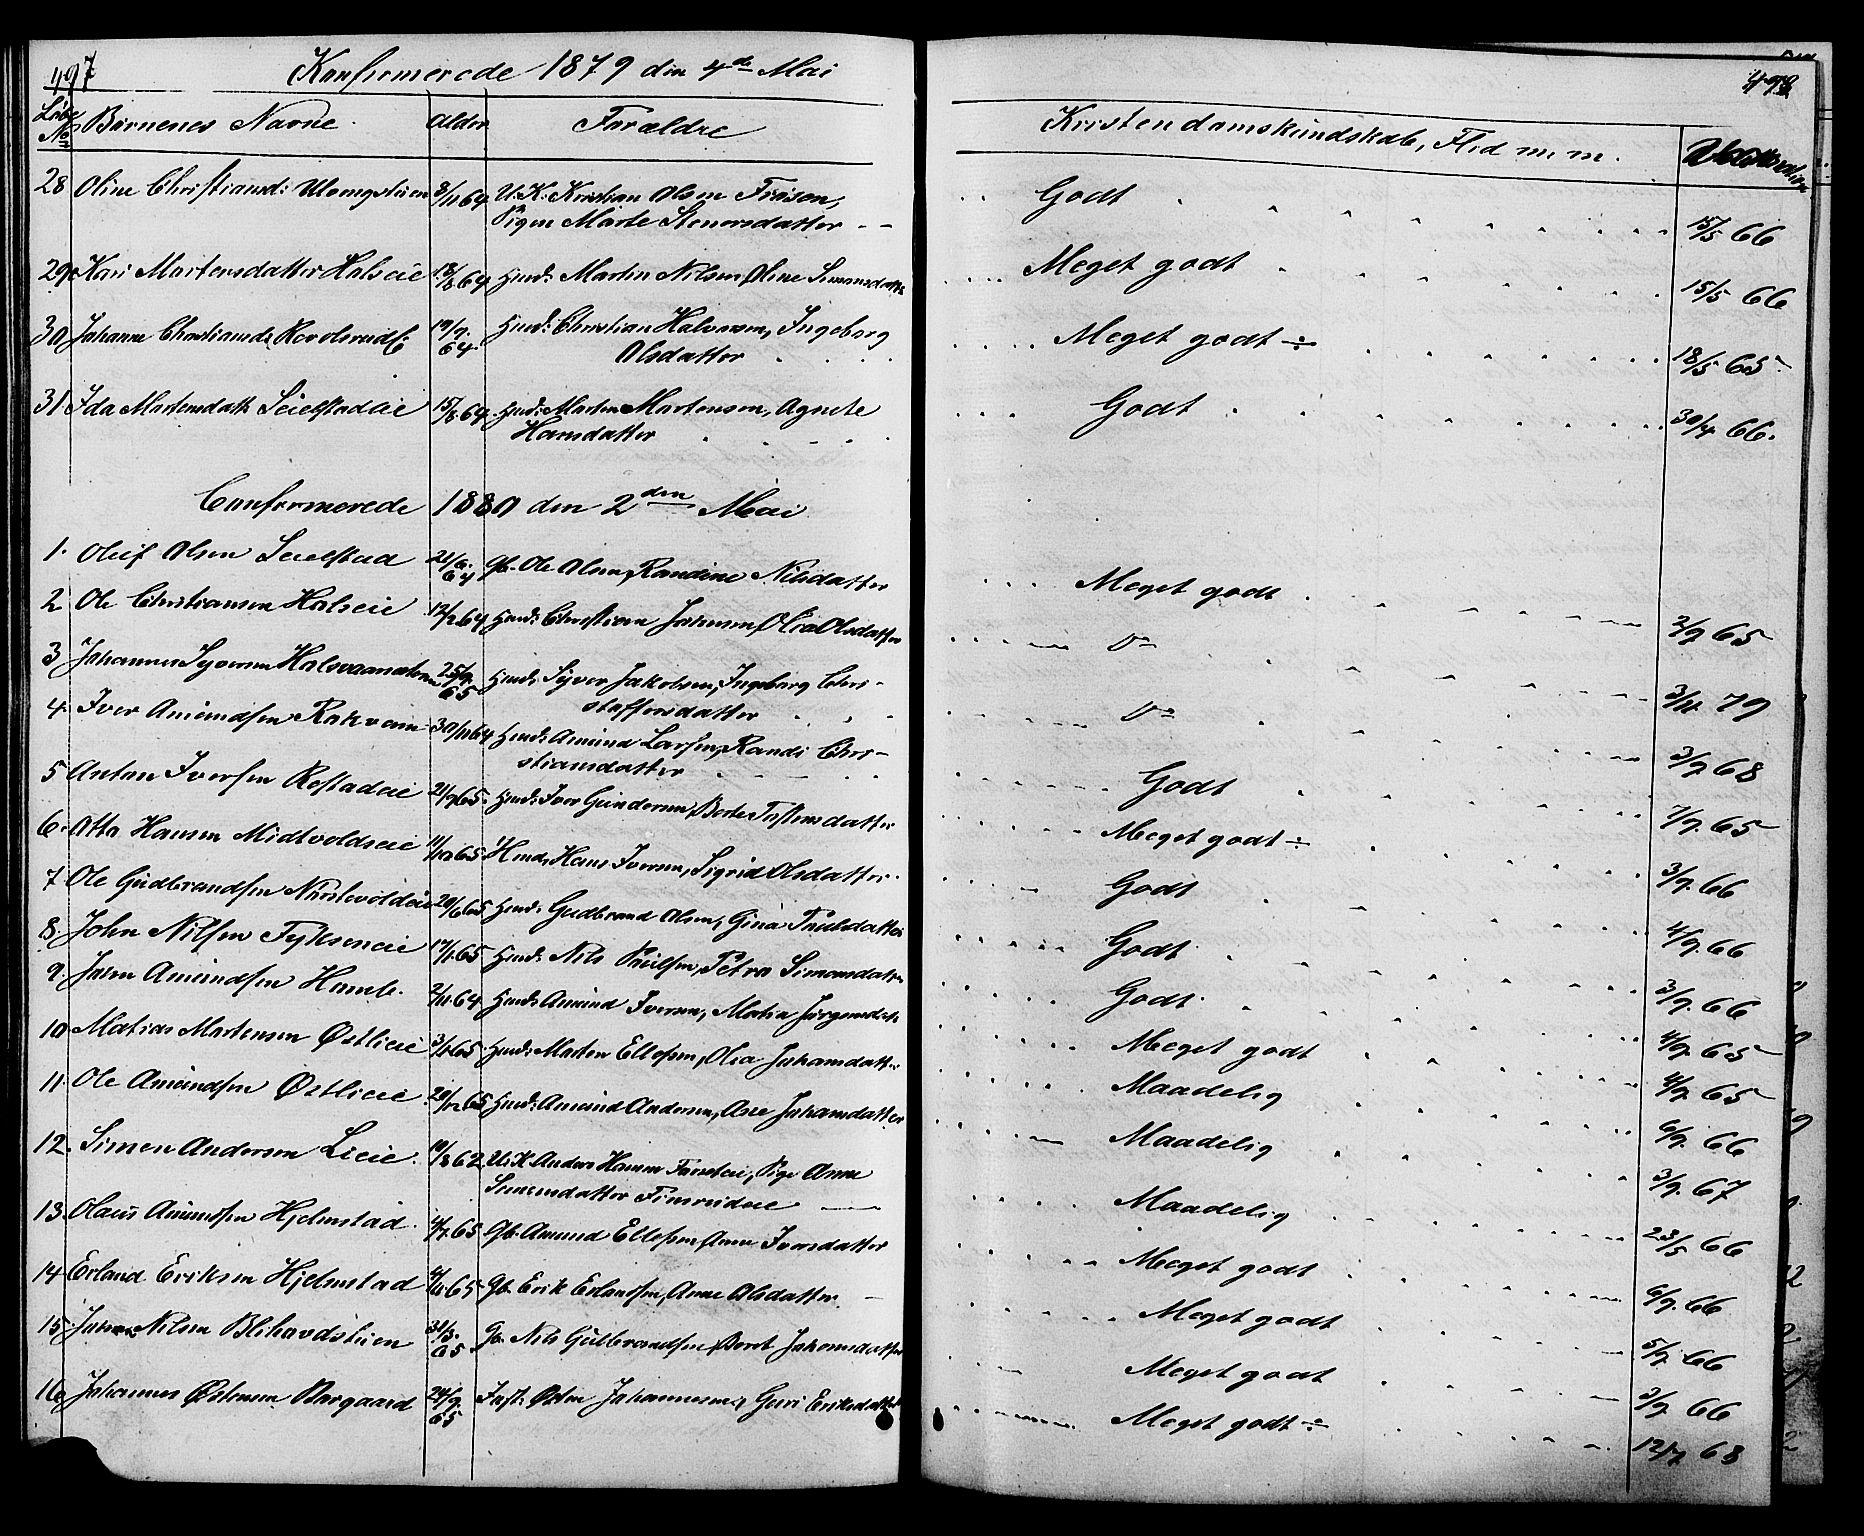 SAH, Østre Gausdal prestekontor, Klokkerbok nr. 1, 1863-1893, s. 497-498